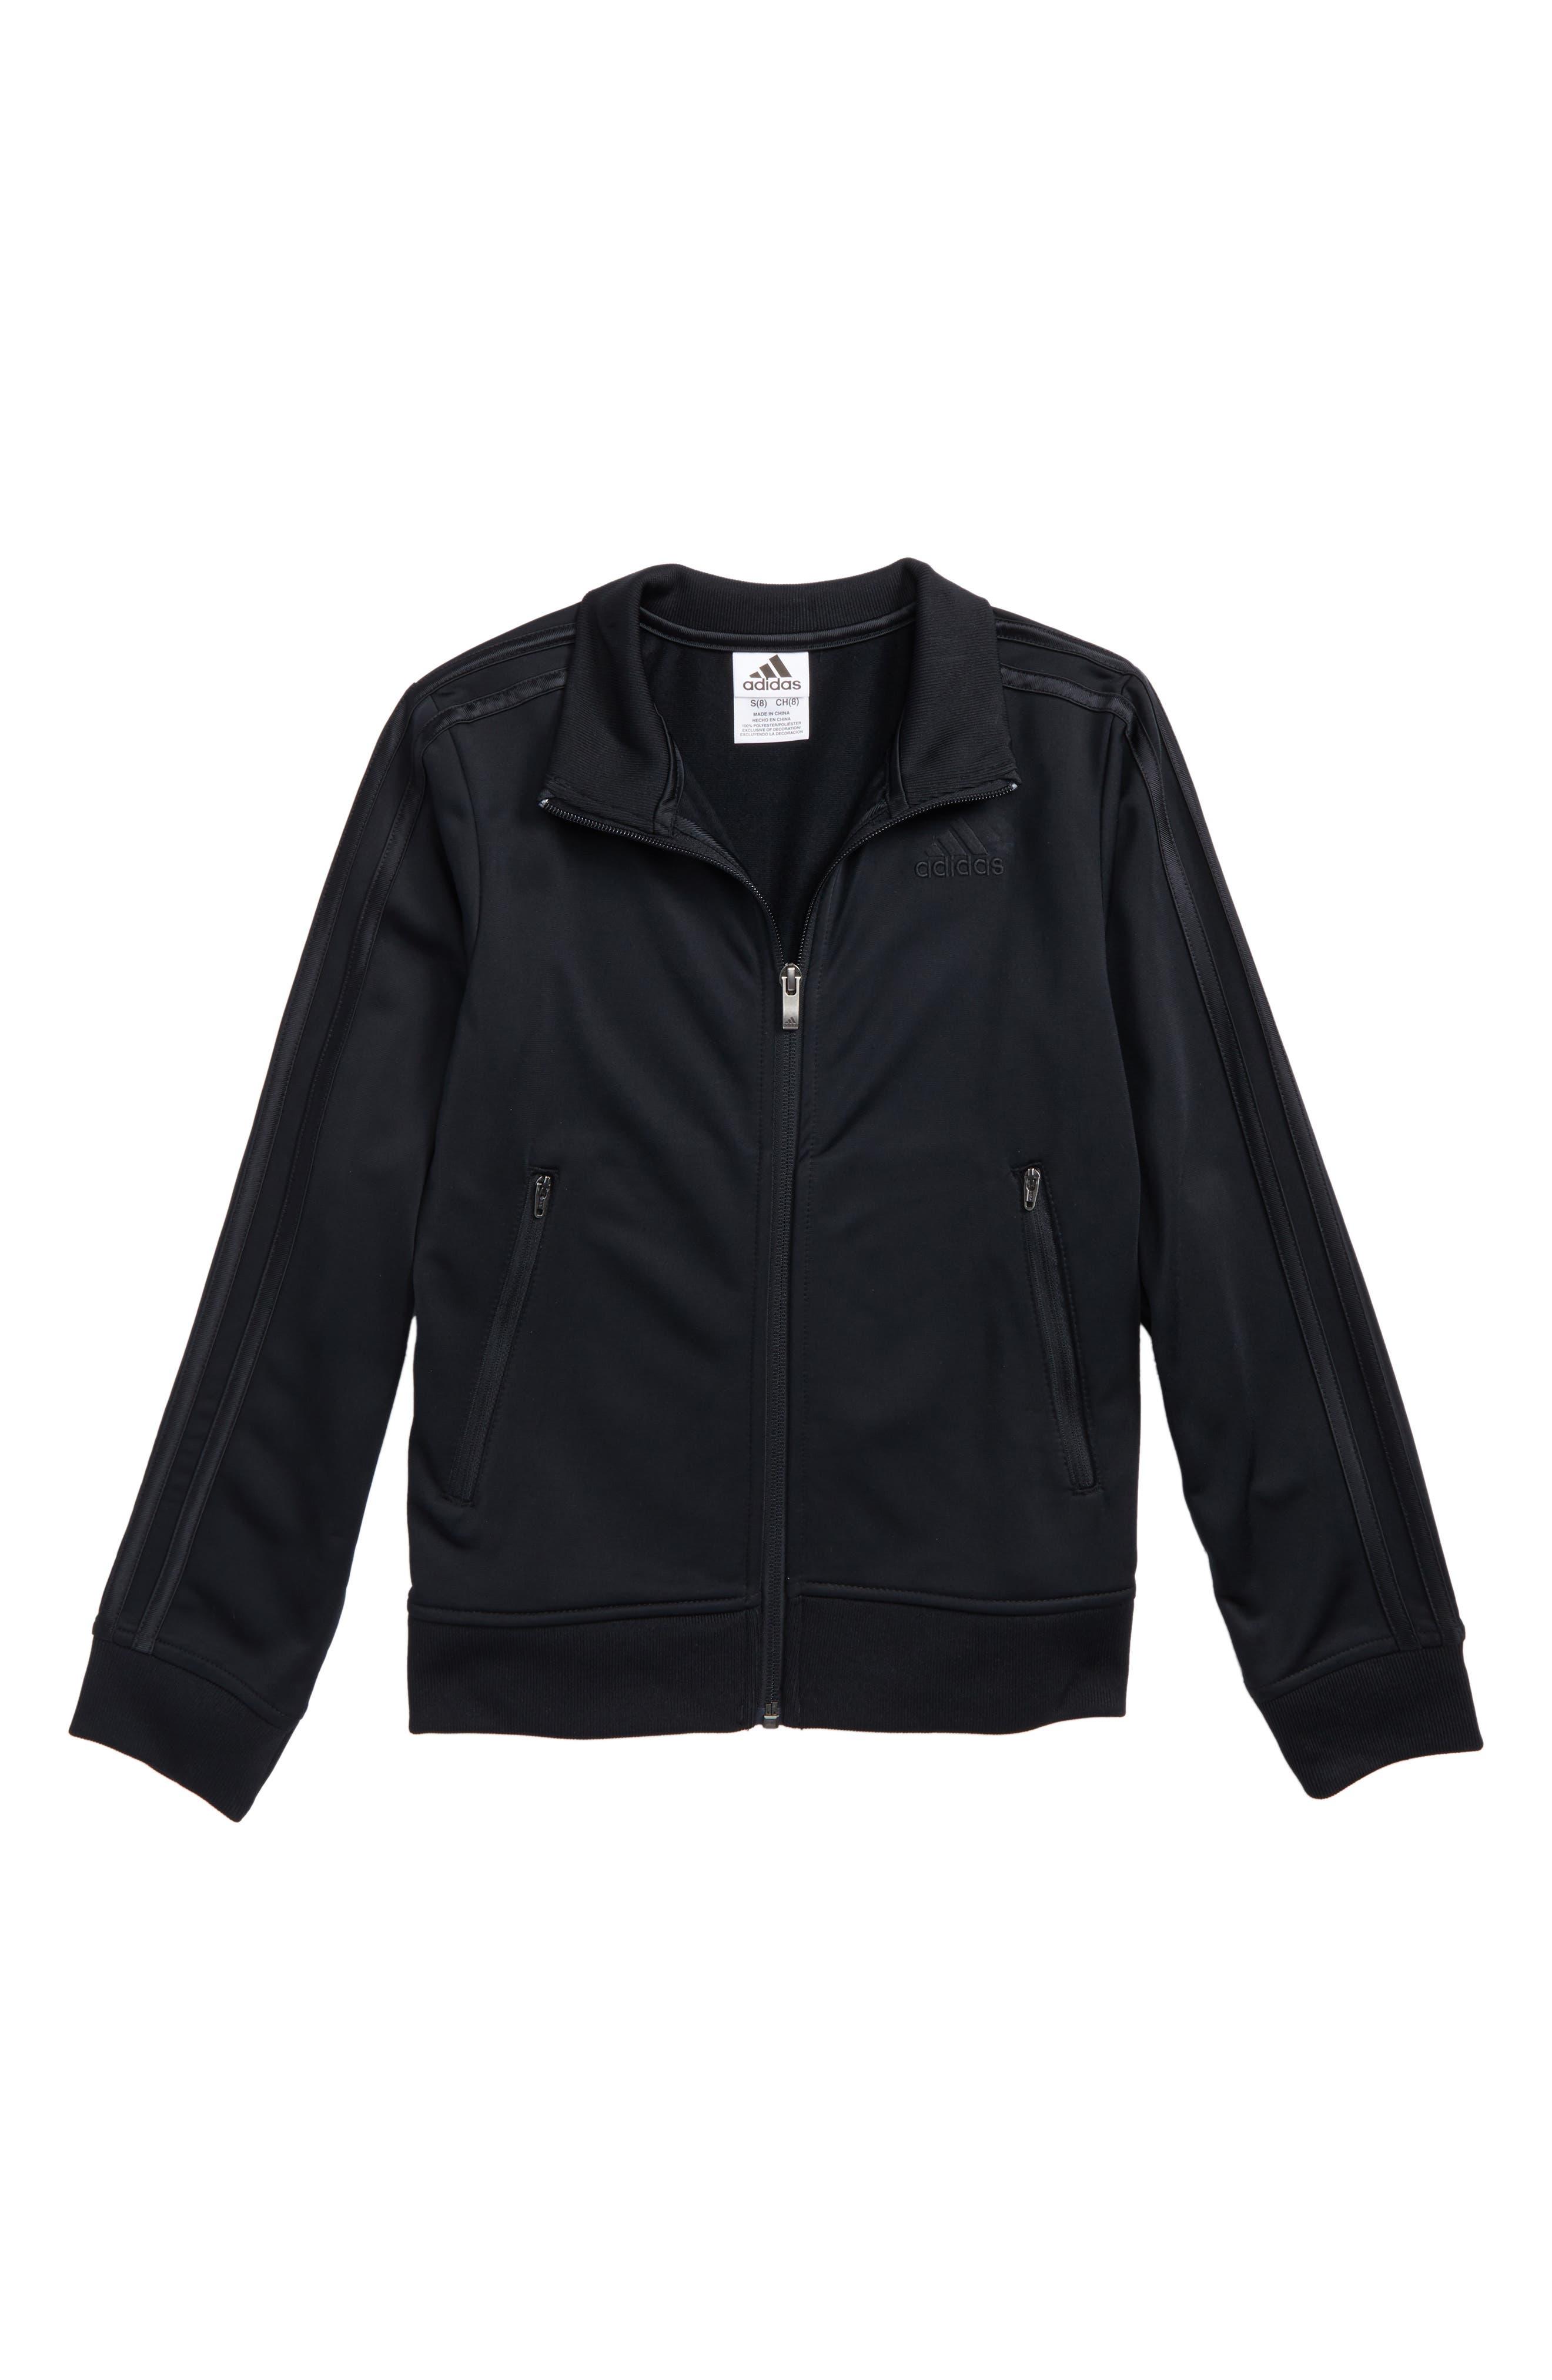 Co-Ed Designator Jacket,                             Main thumbnail 1, color,                             004